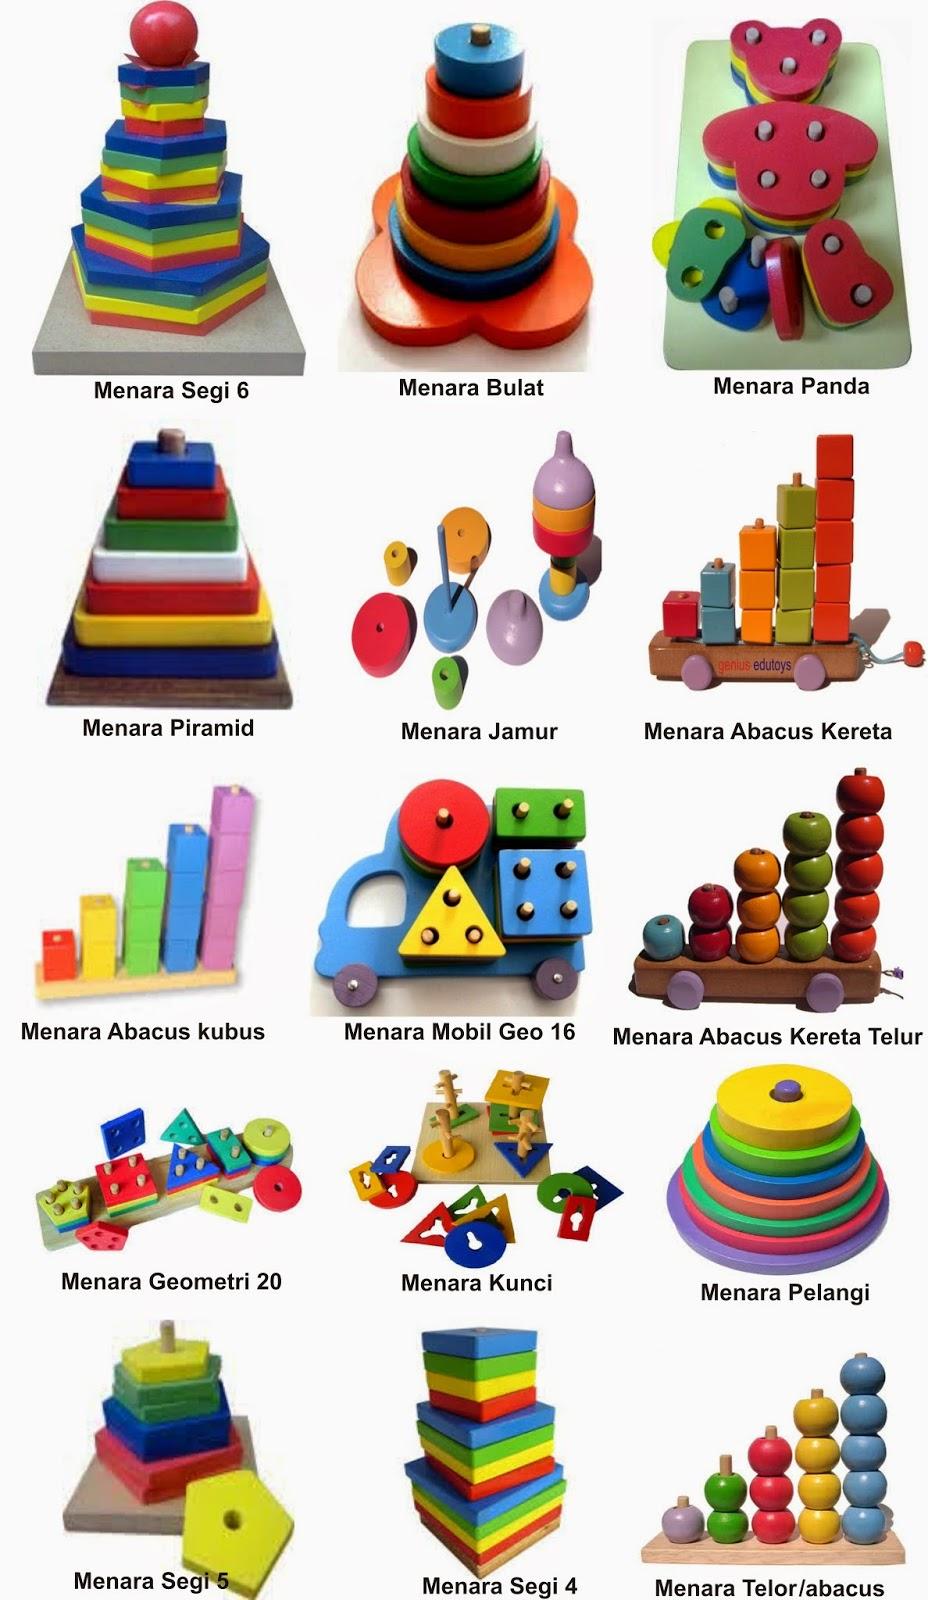 Produsen Mainan dan Alat Peraga Edukatif Produksi dan